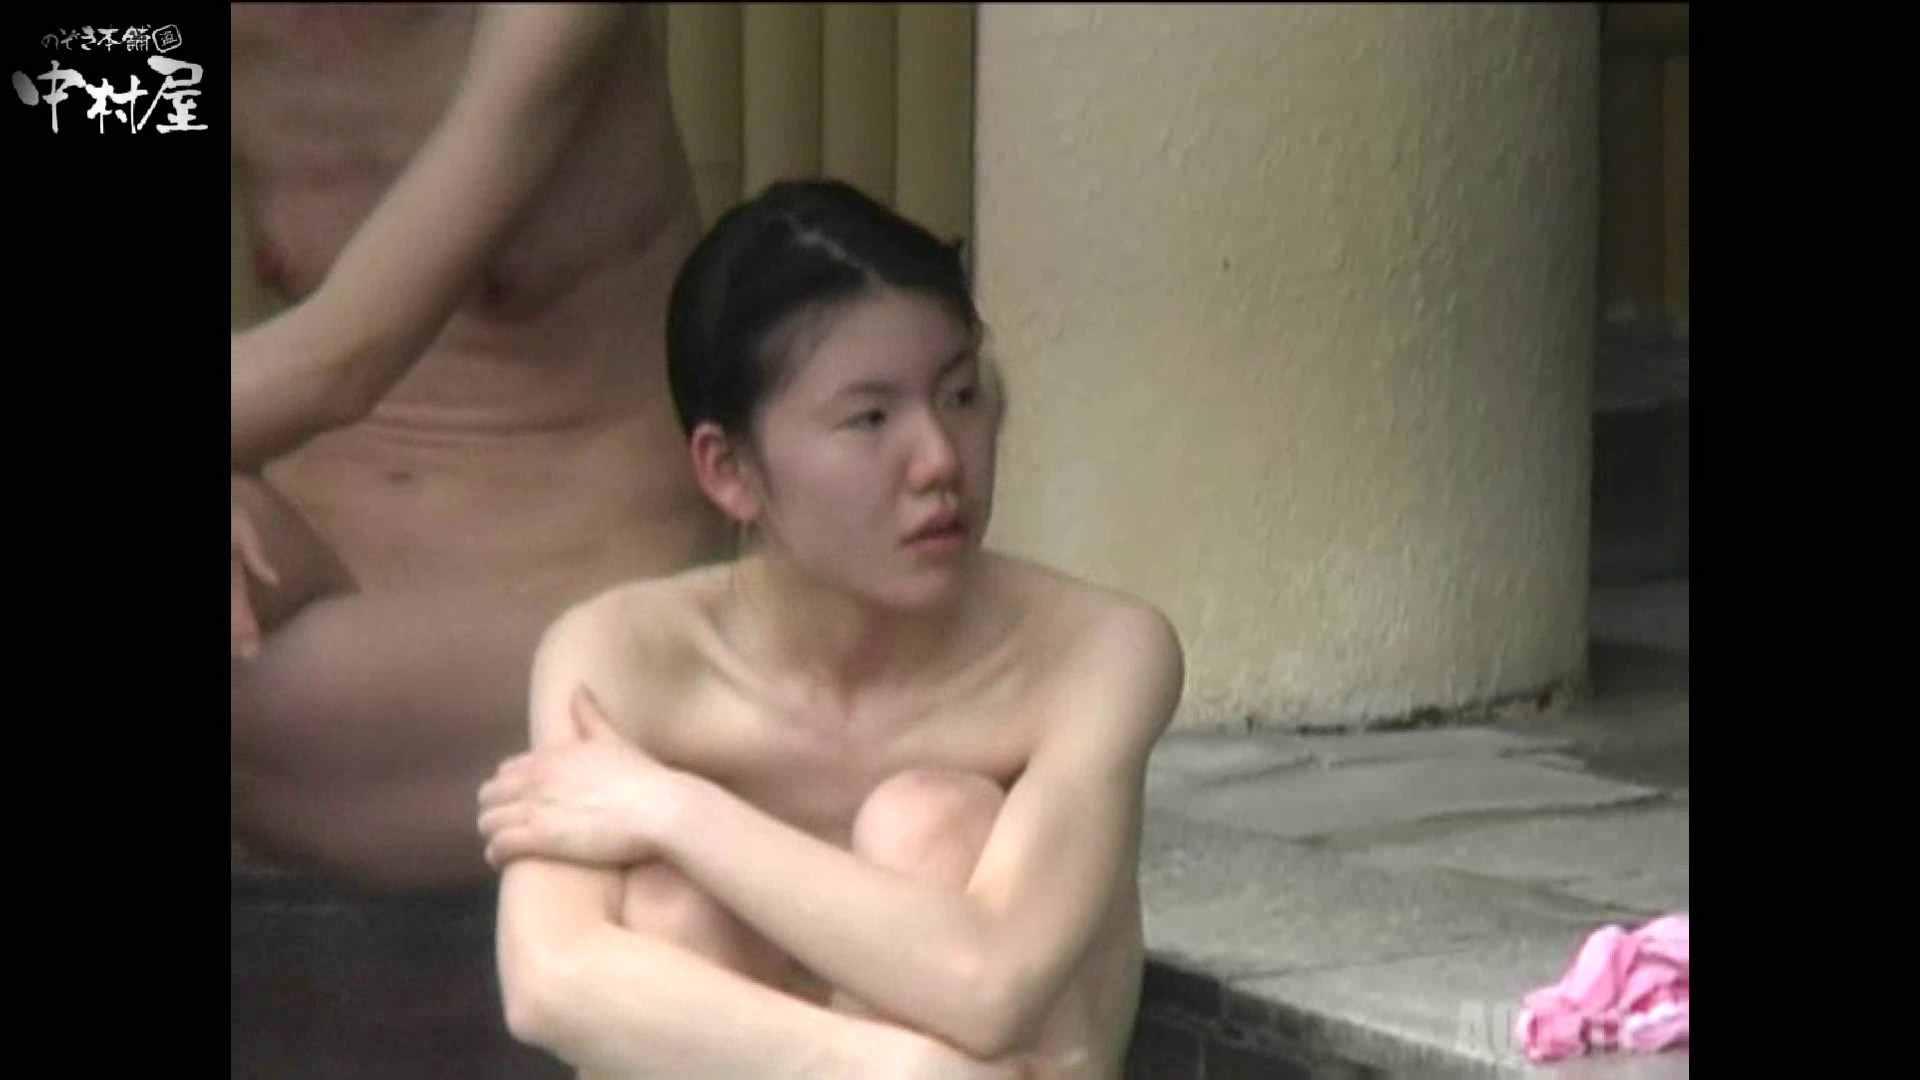 Aquaな露天風呂Vol.875潜入盗撮露天風呂十一判湯 其の六 潜入 | 盗撮  53画像 25